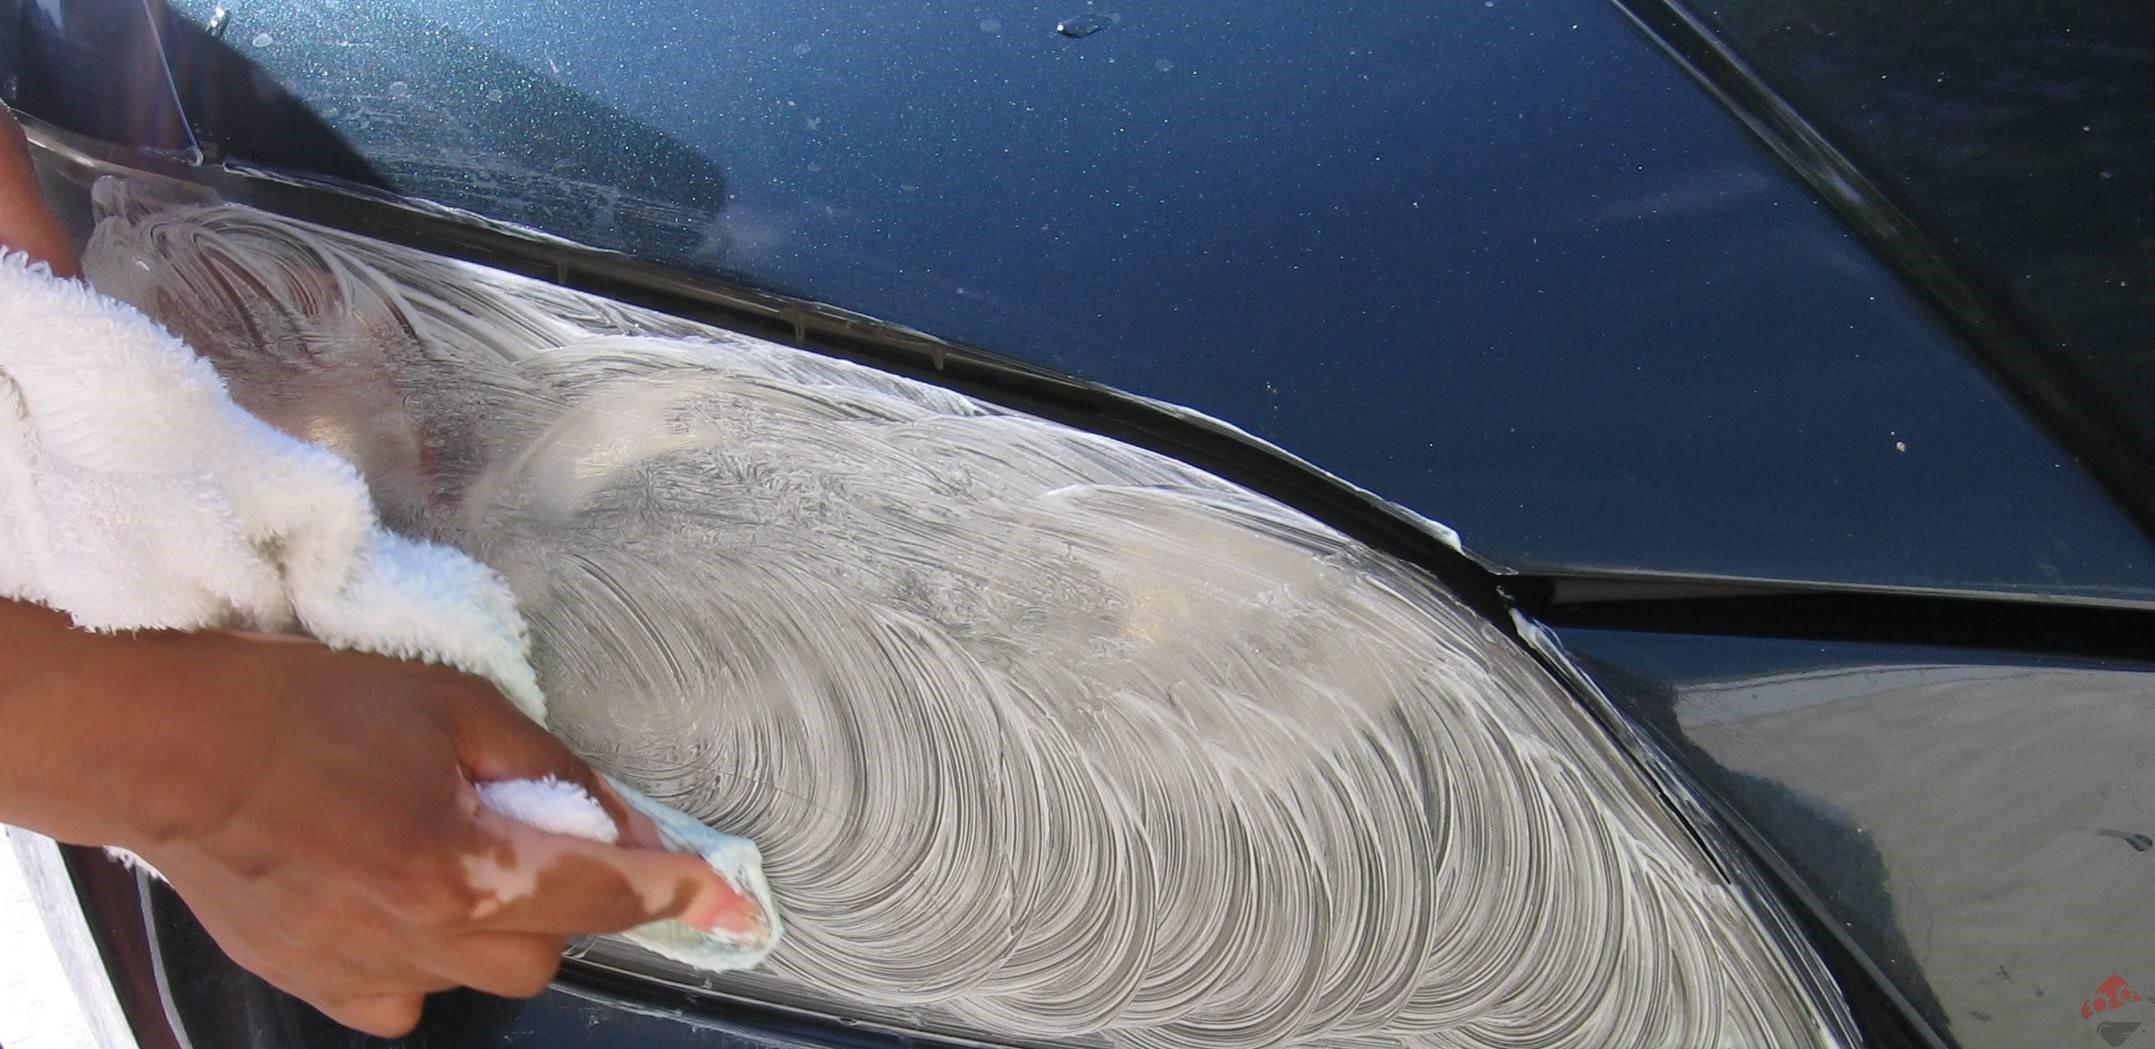 تمیز کردن چراغ خودرو